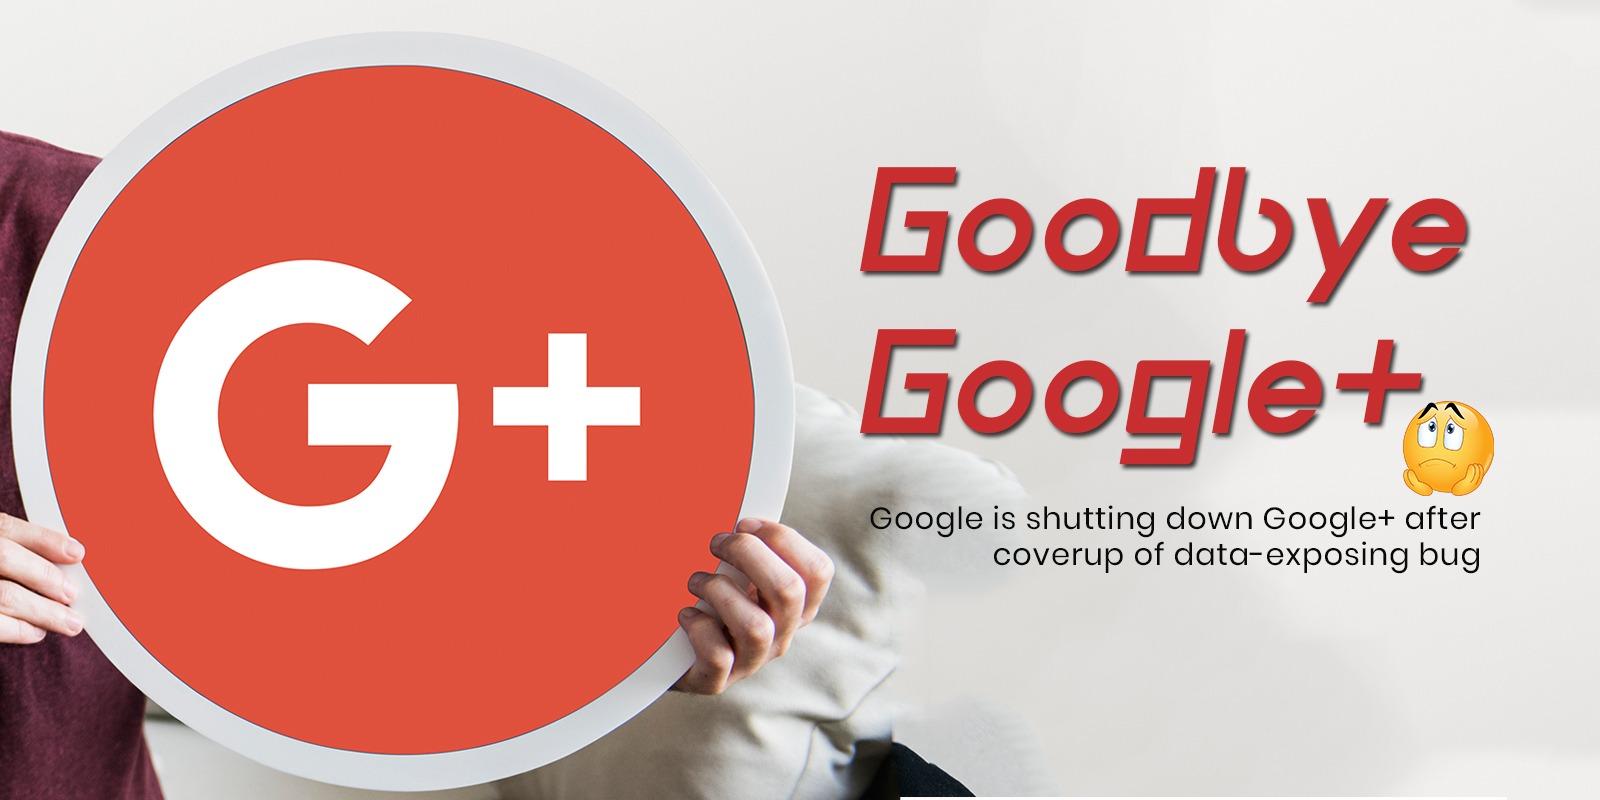 Google is Shutting Down Google+